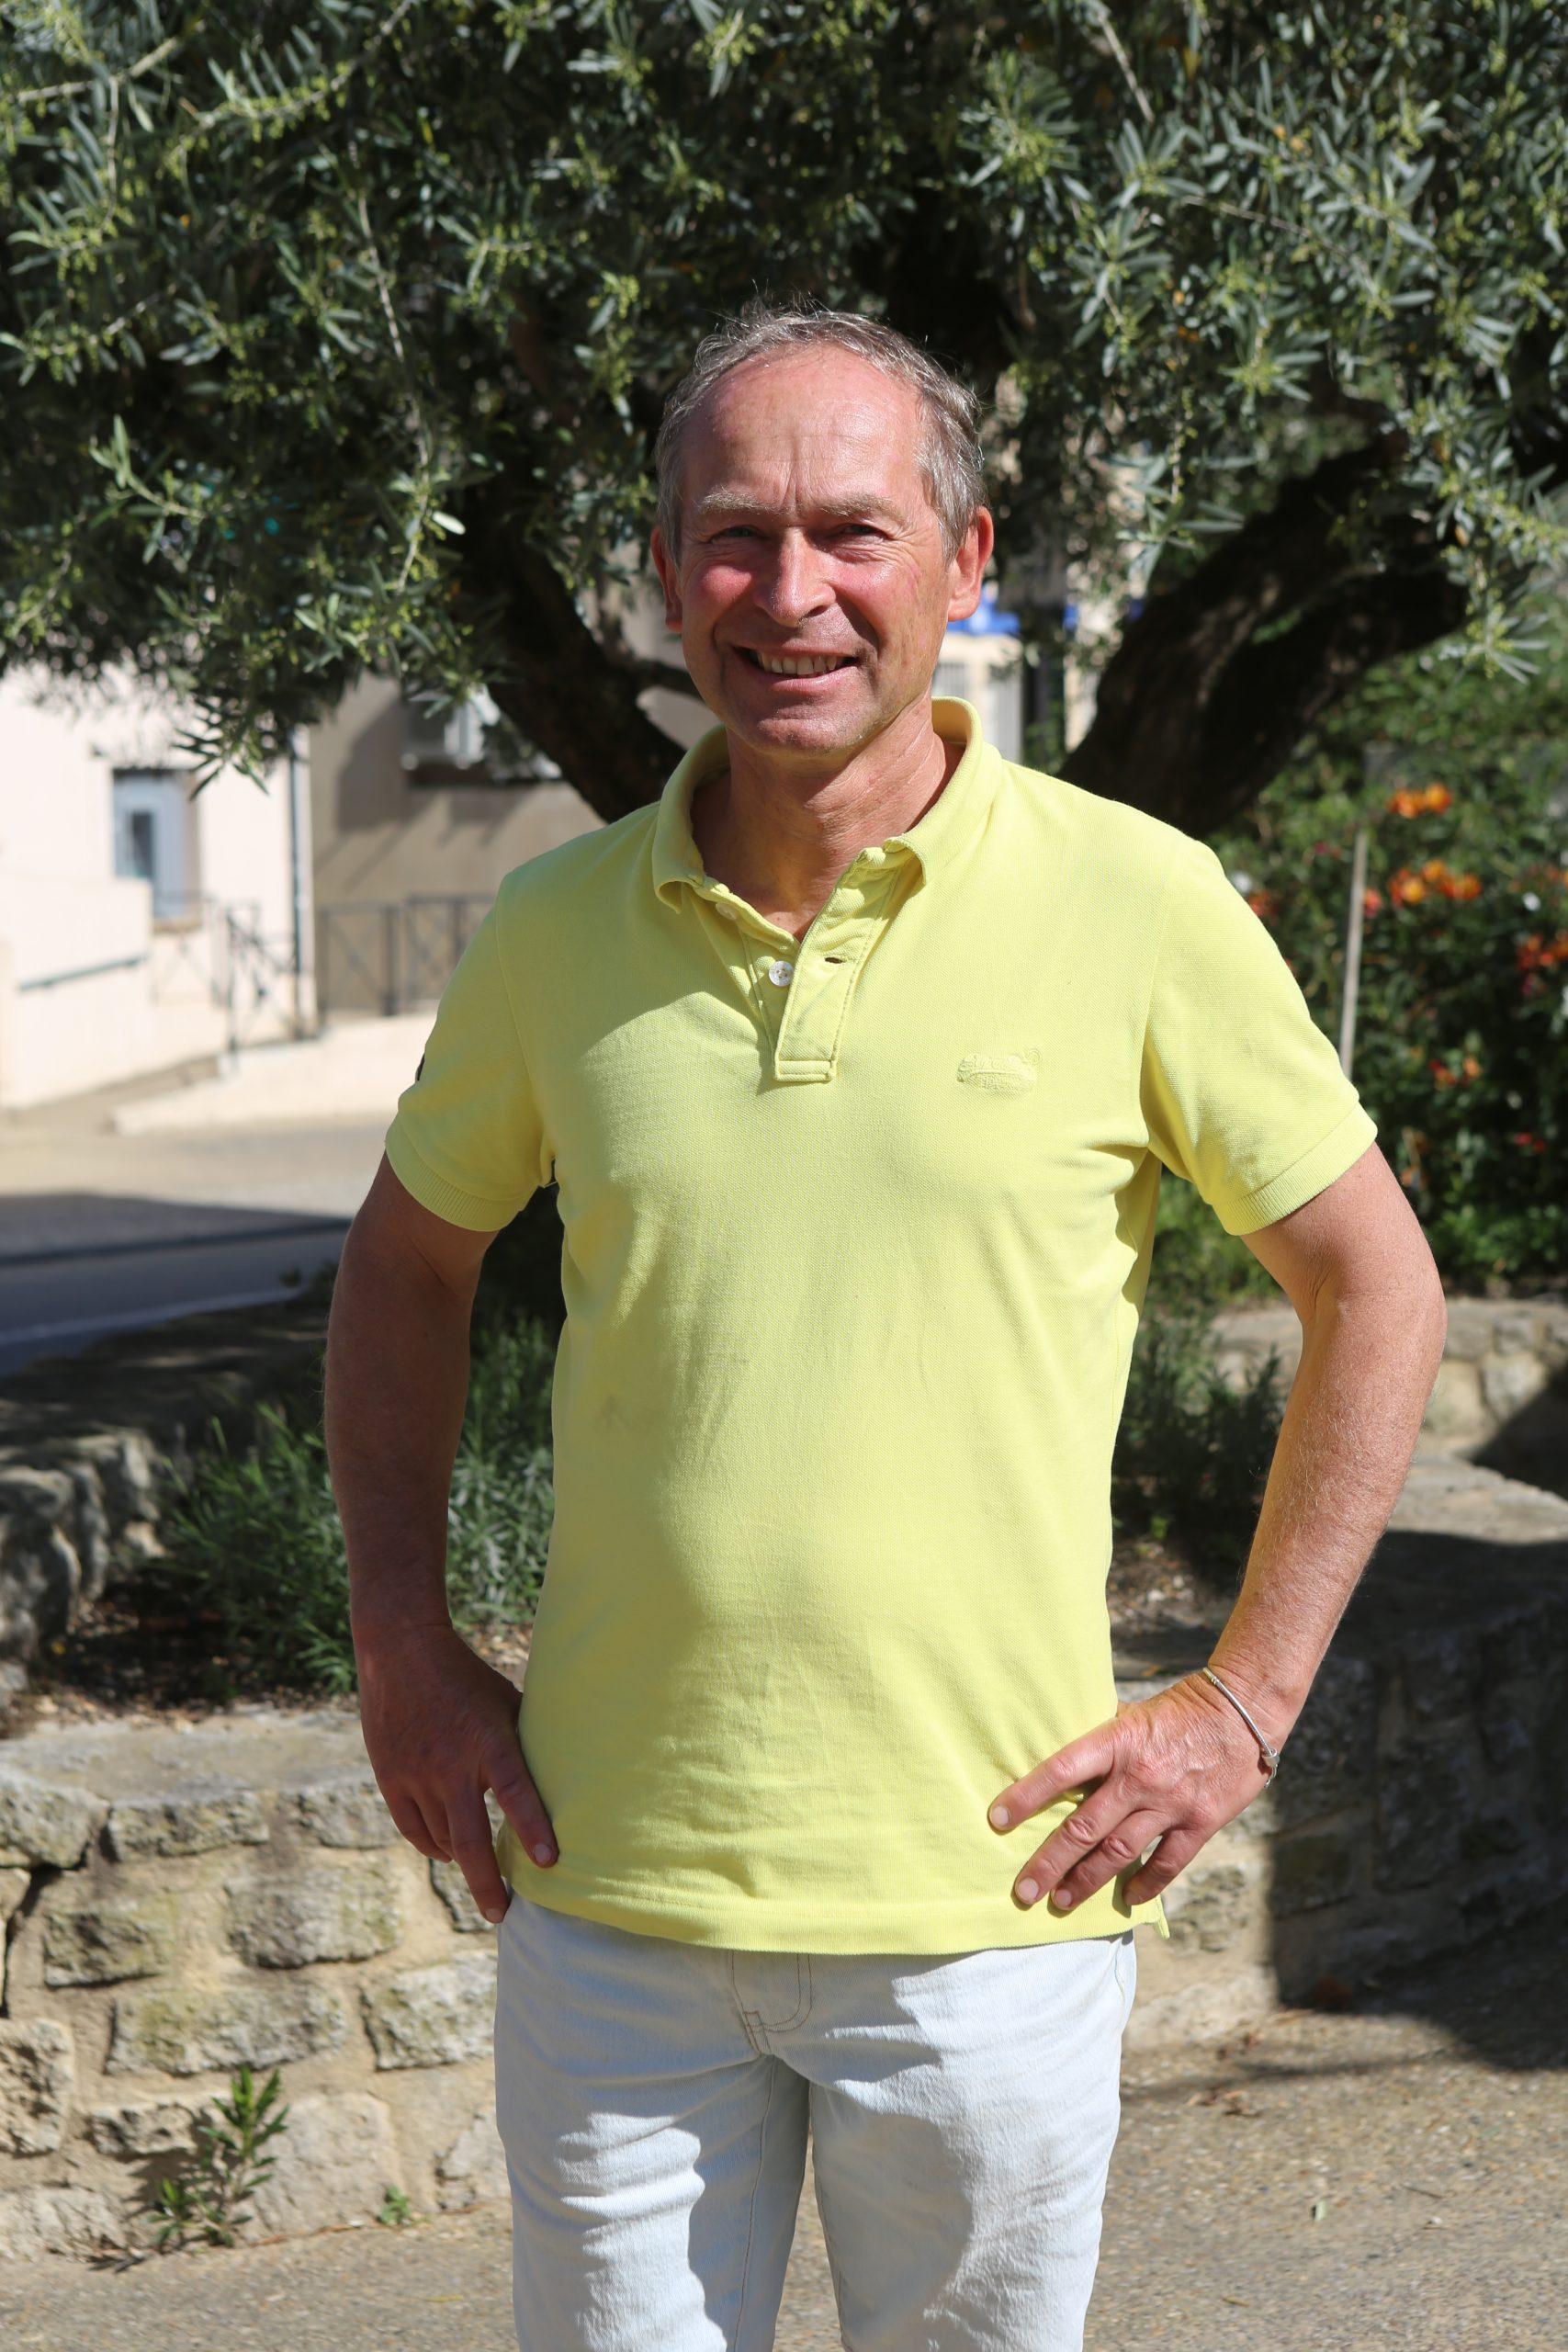 Laurent Moy